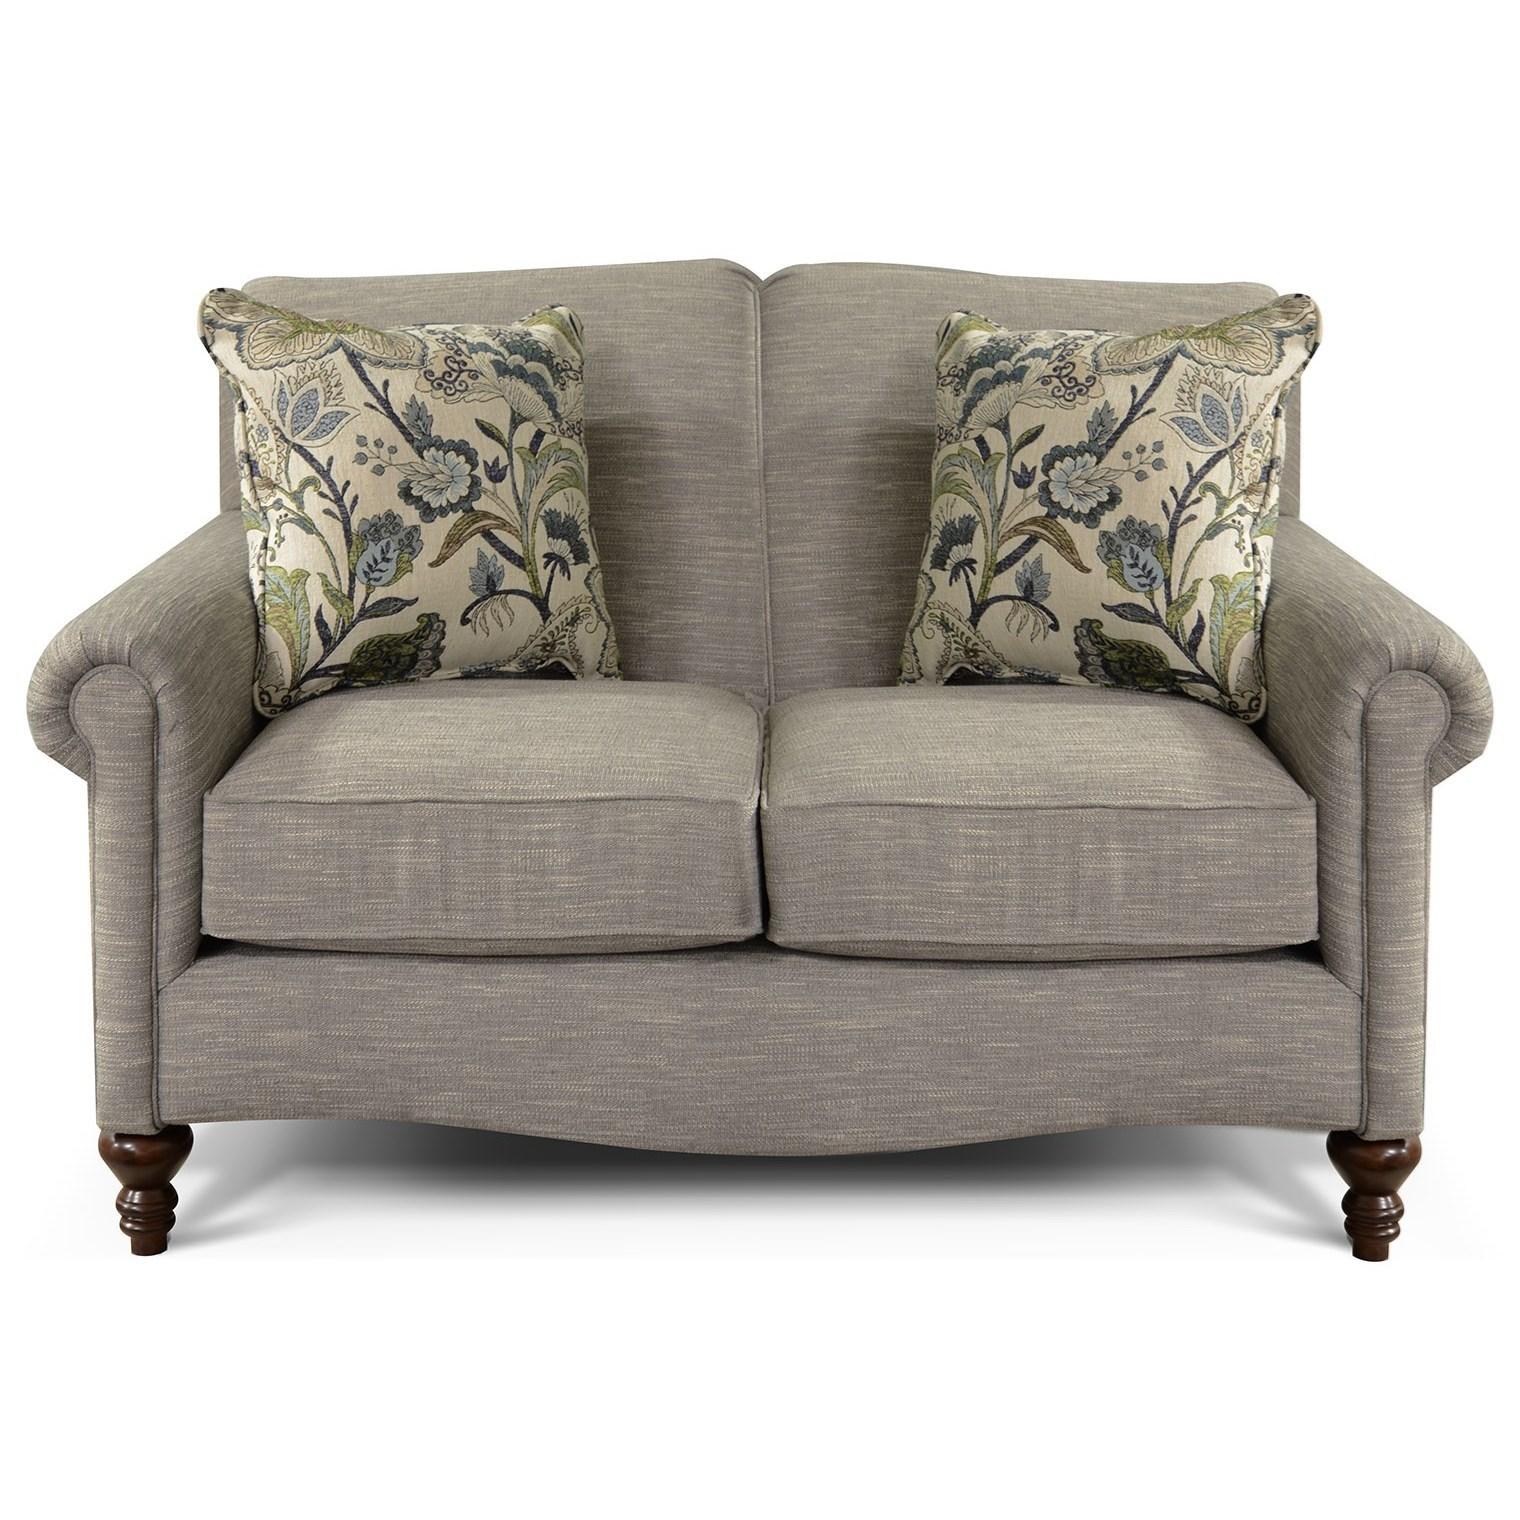 Eliza Loveseat by England at Suburban Furniture